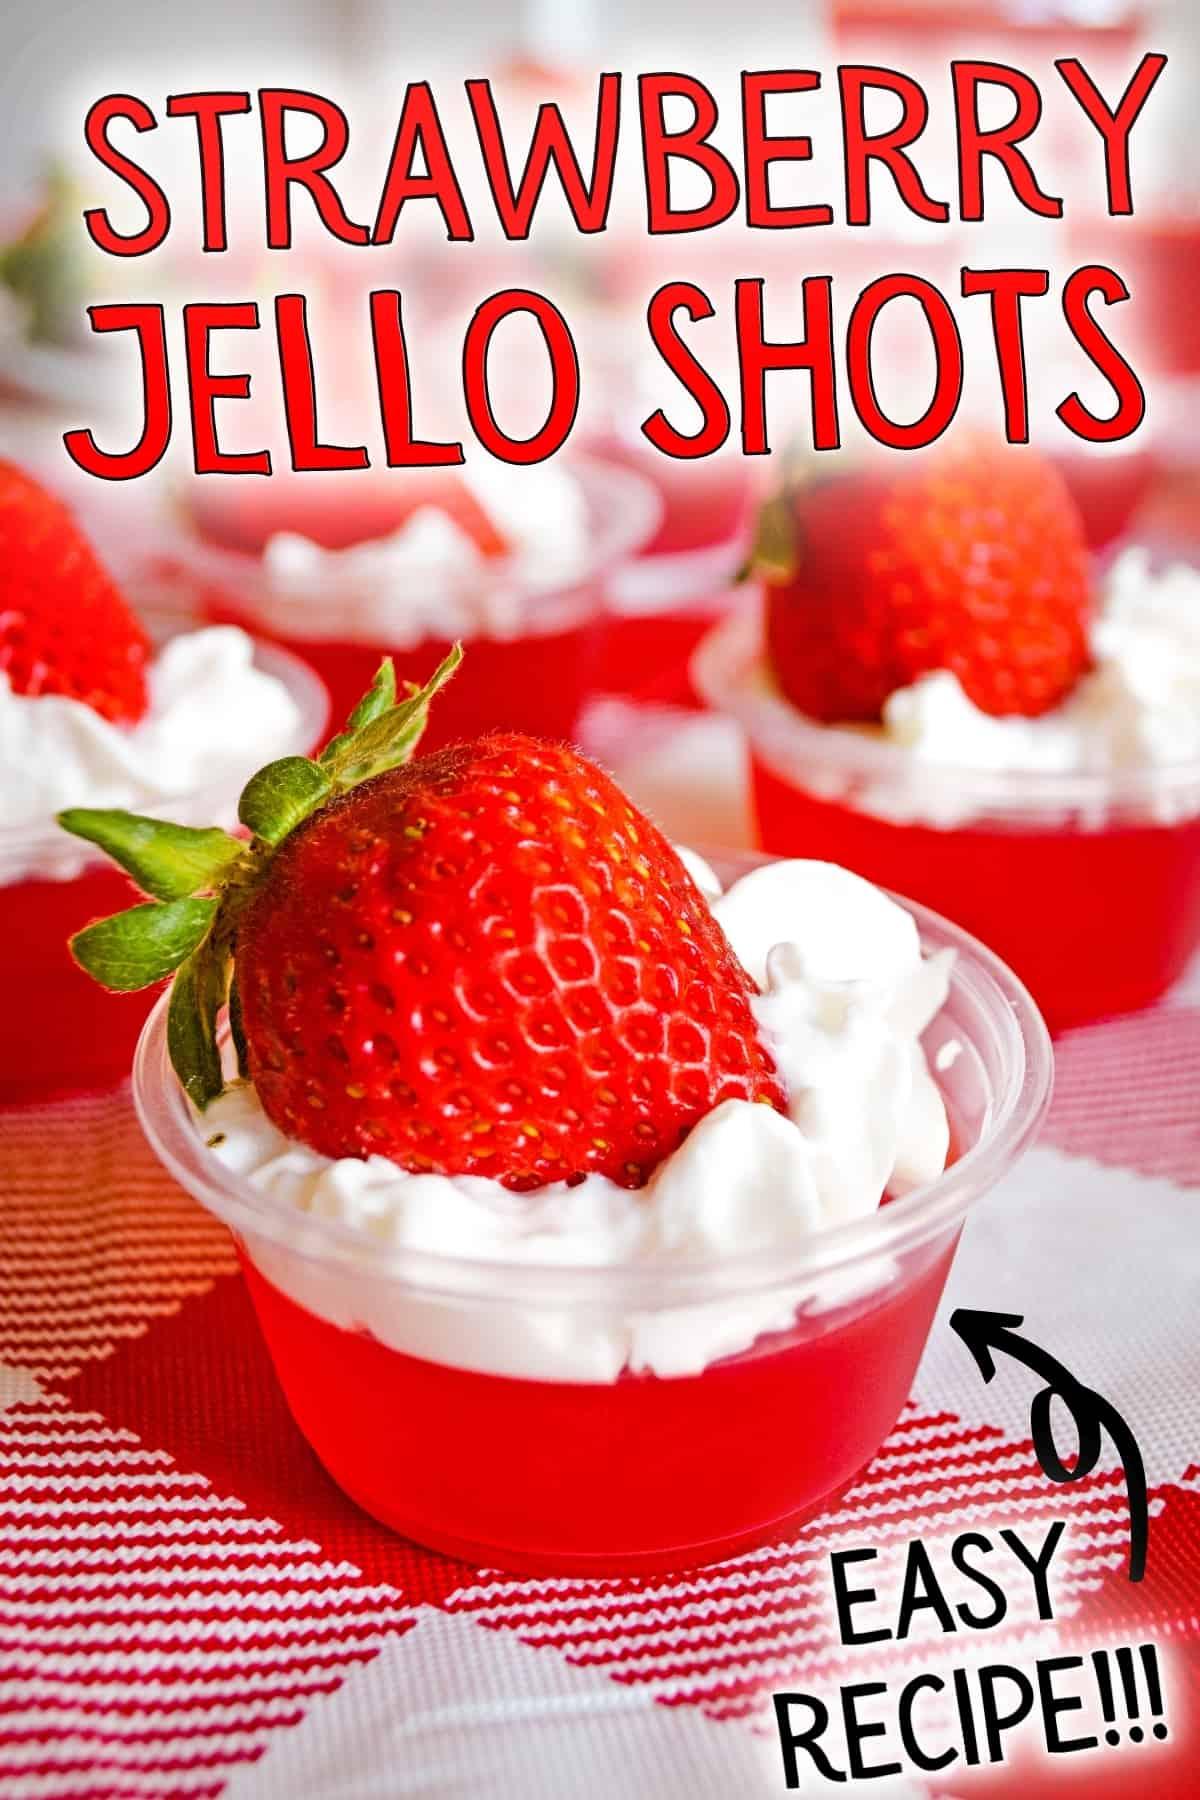 Pinterest image, reads: Strawberry Jello Shots; Easy Recipe!!!